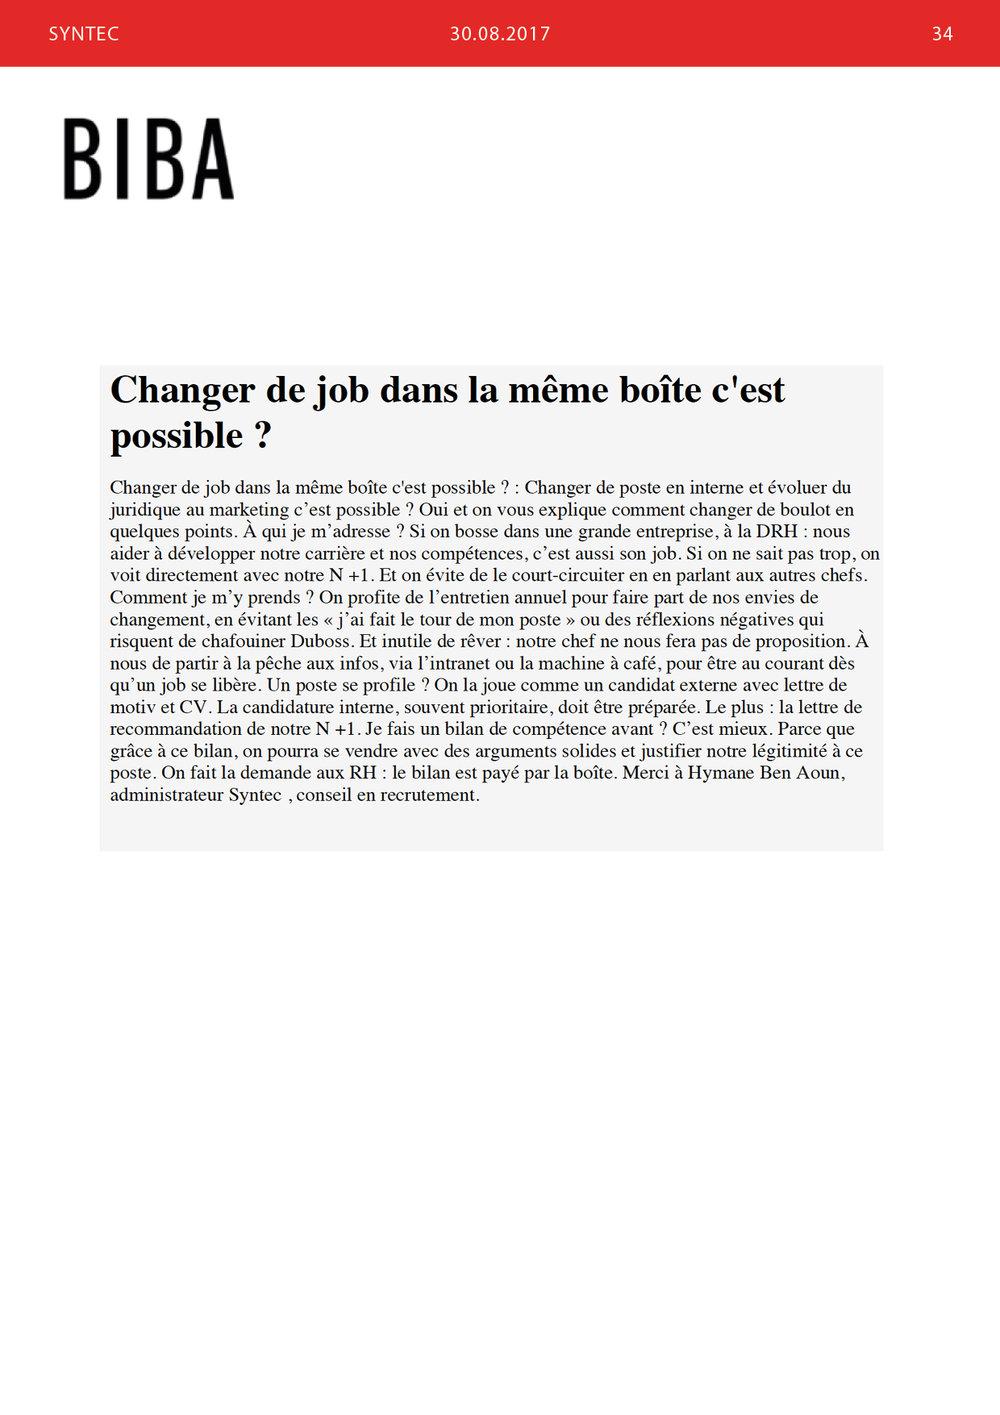 BOOKMEDIA_JAOUT_034.jpg